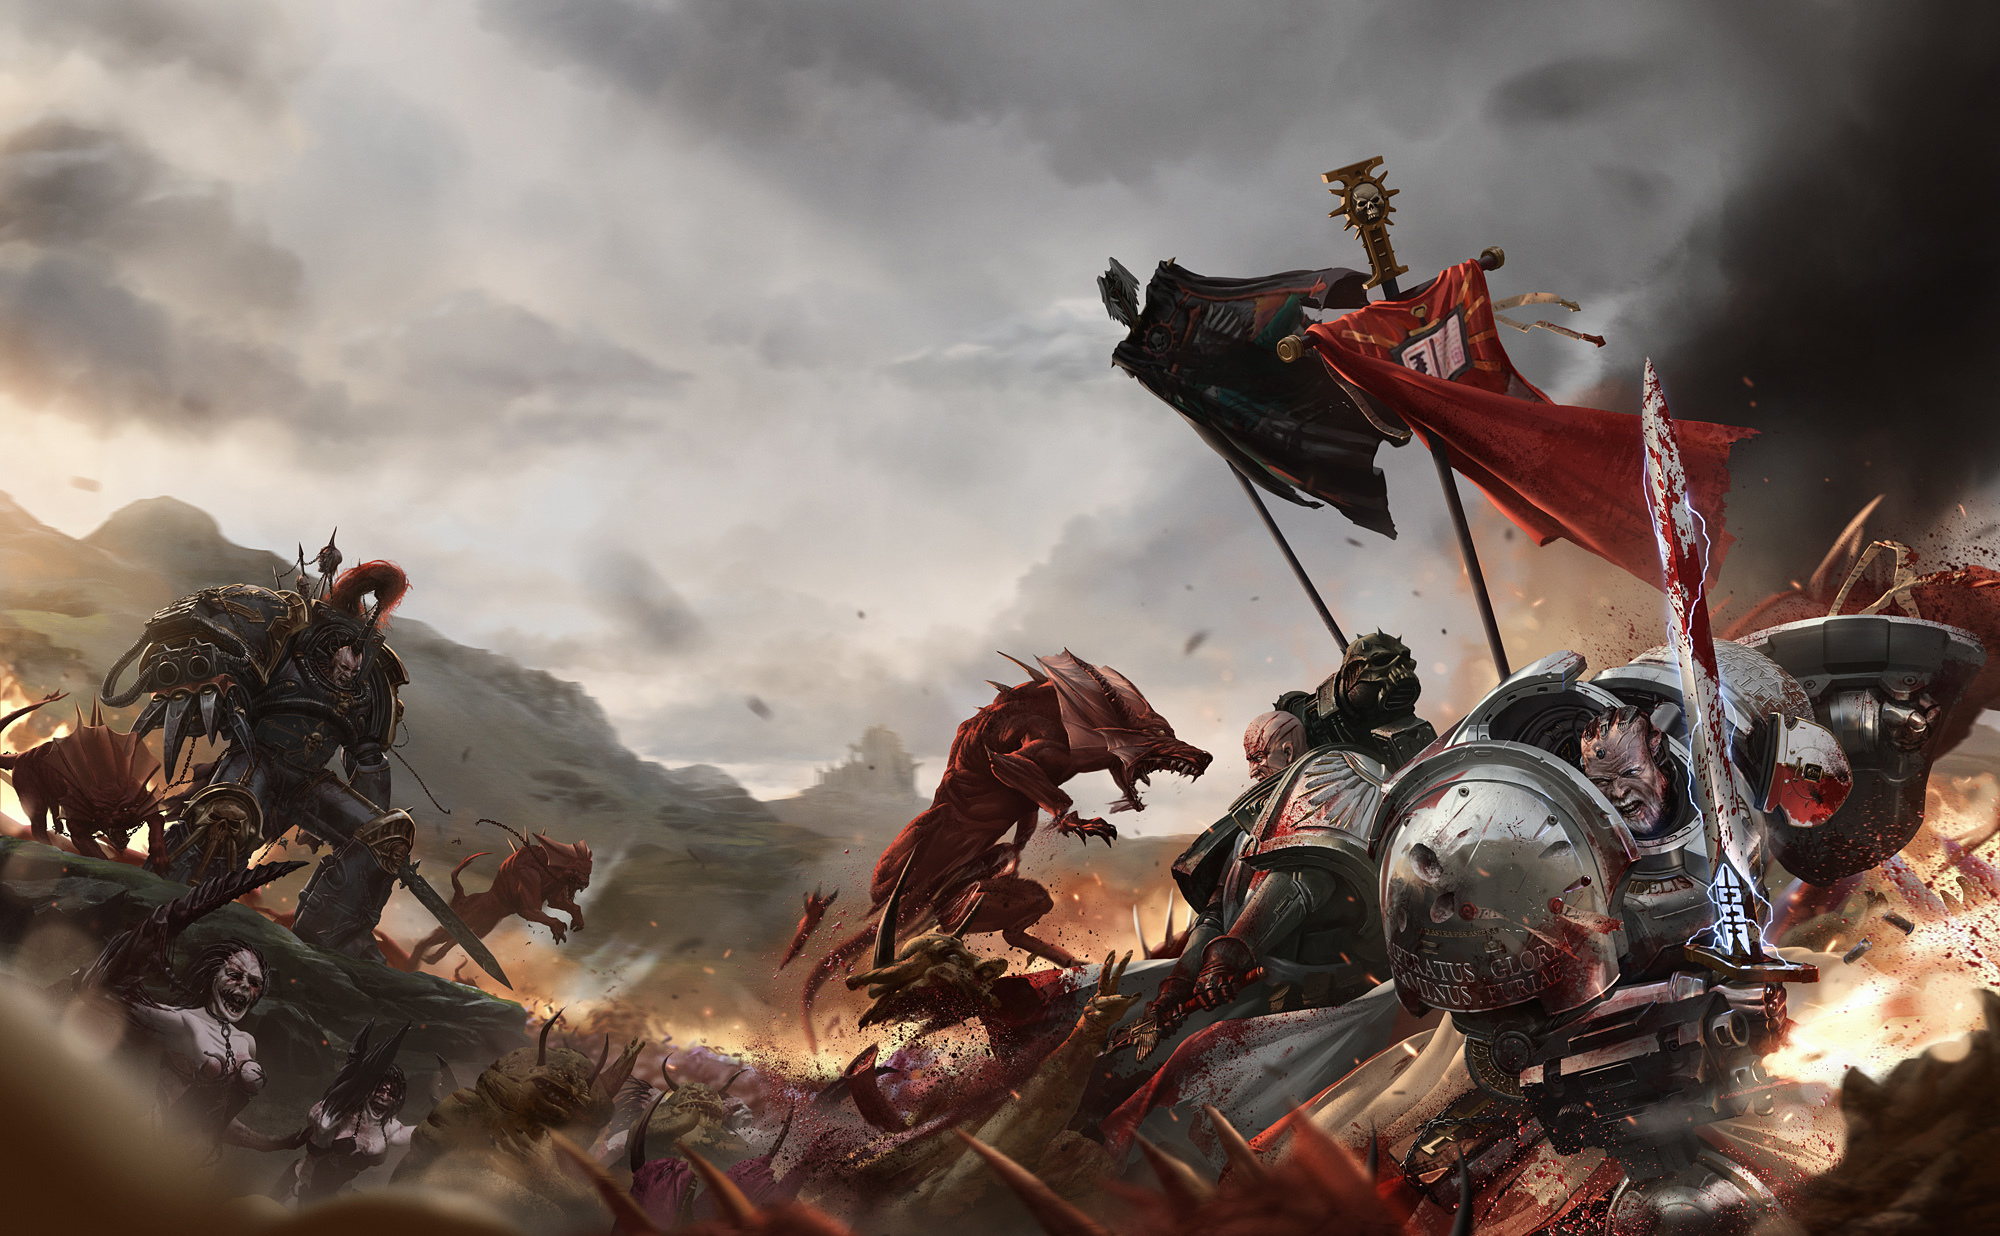 Warhammer 40k Hd Wallpaper Background Image 2000x1236 Id